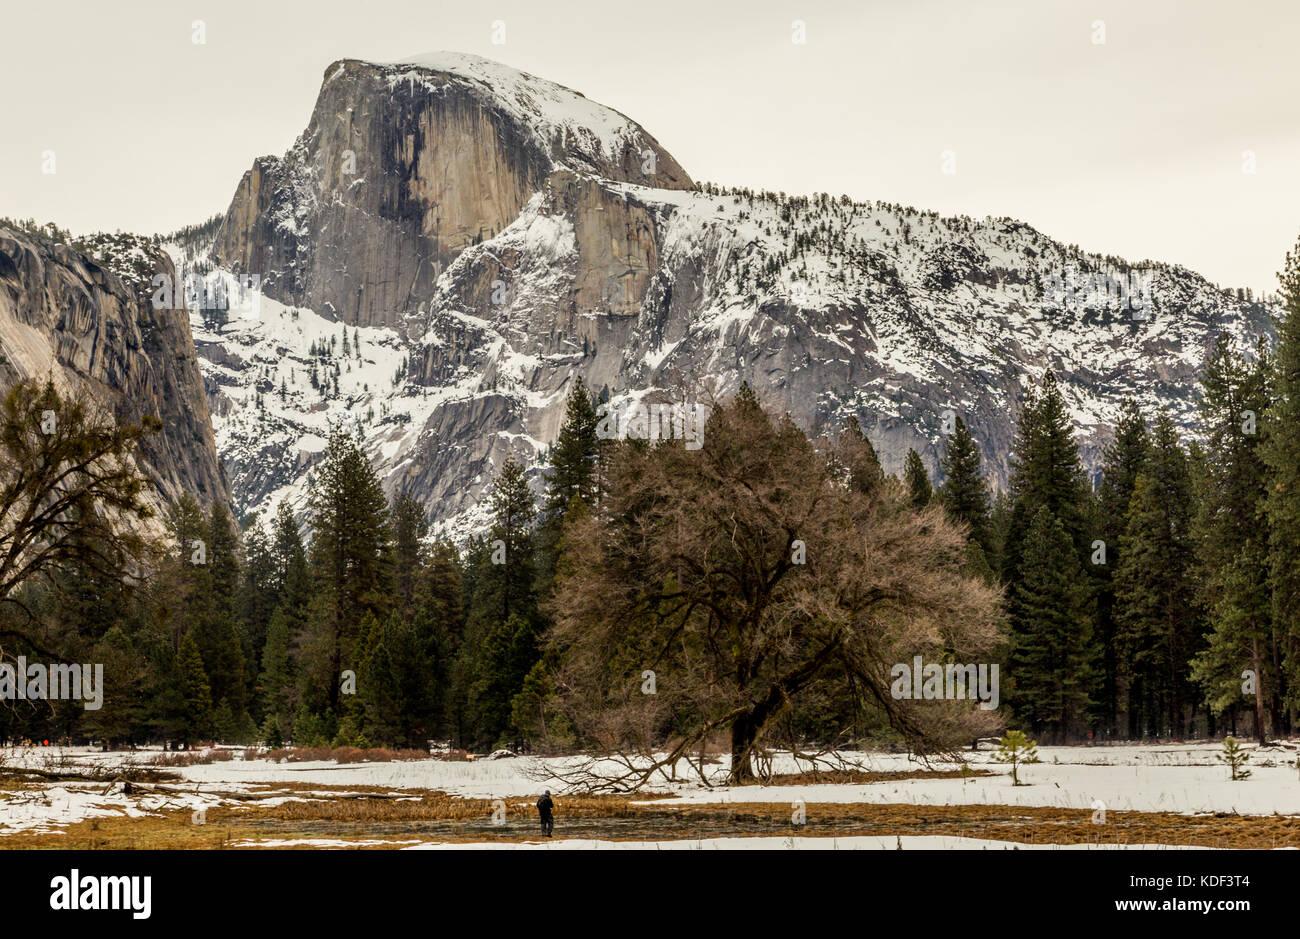 Half Dome, Yosemite National Park, California, America Stock Photo